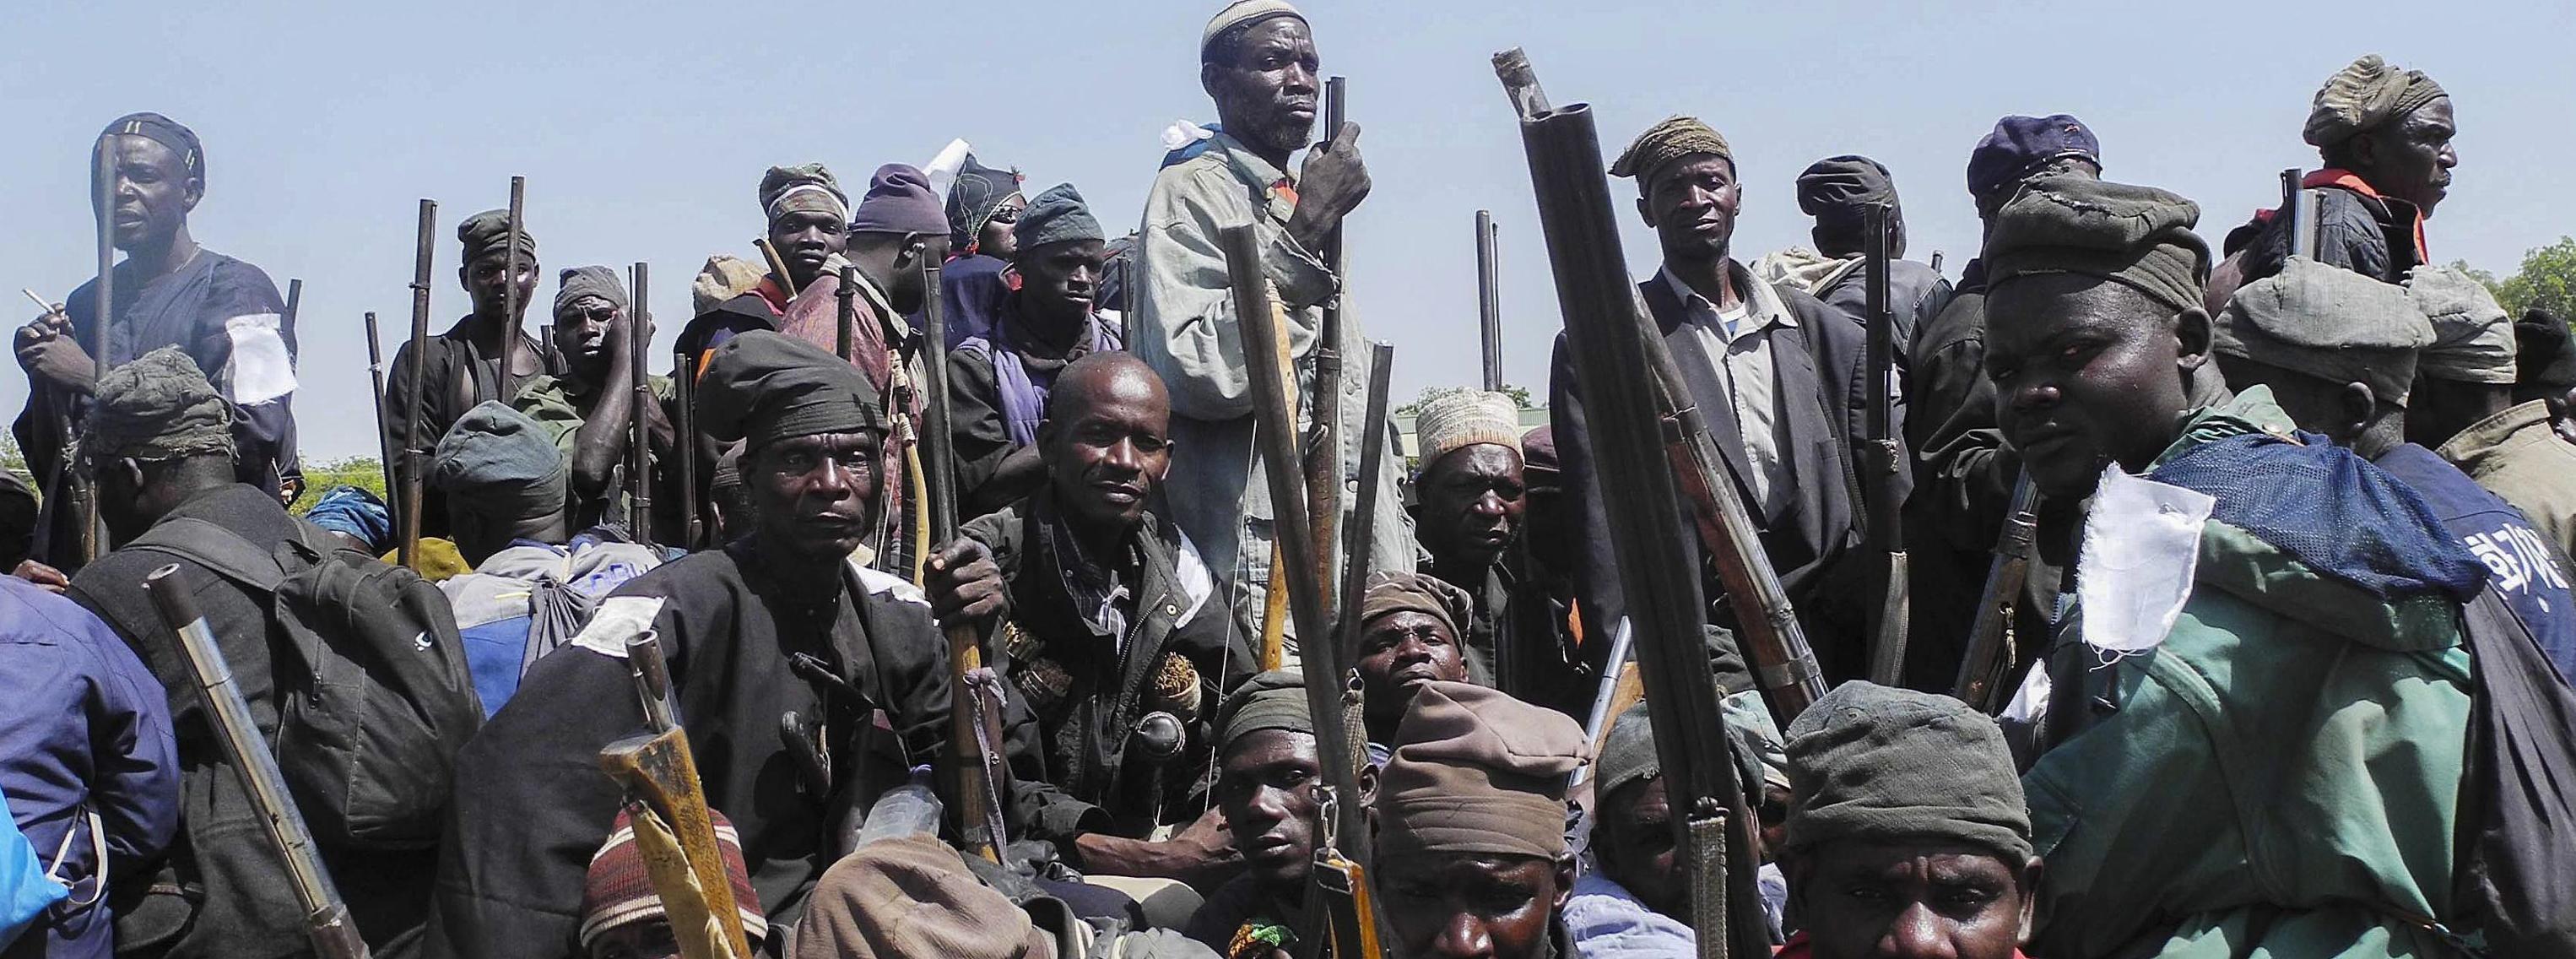 Miliziani volontari anti-Boko Haram in Nigeria